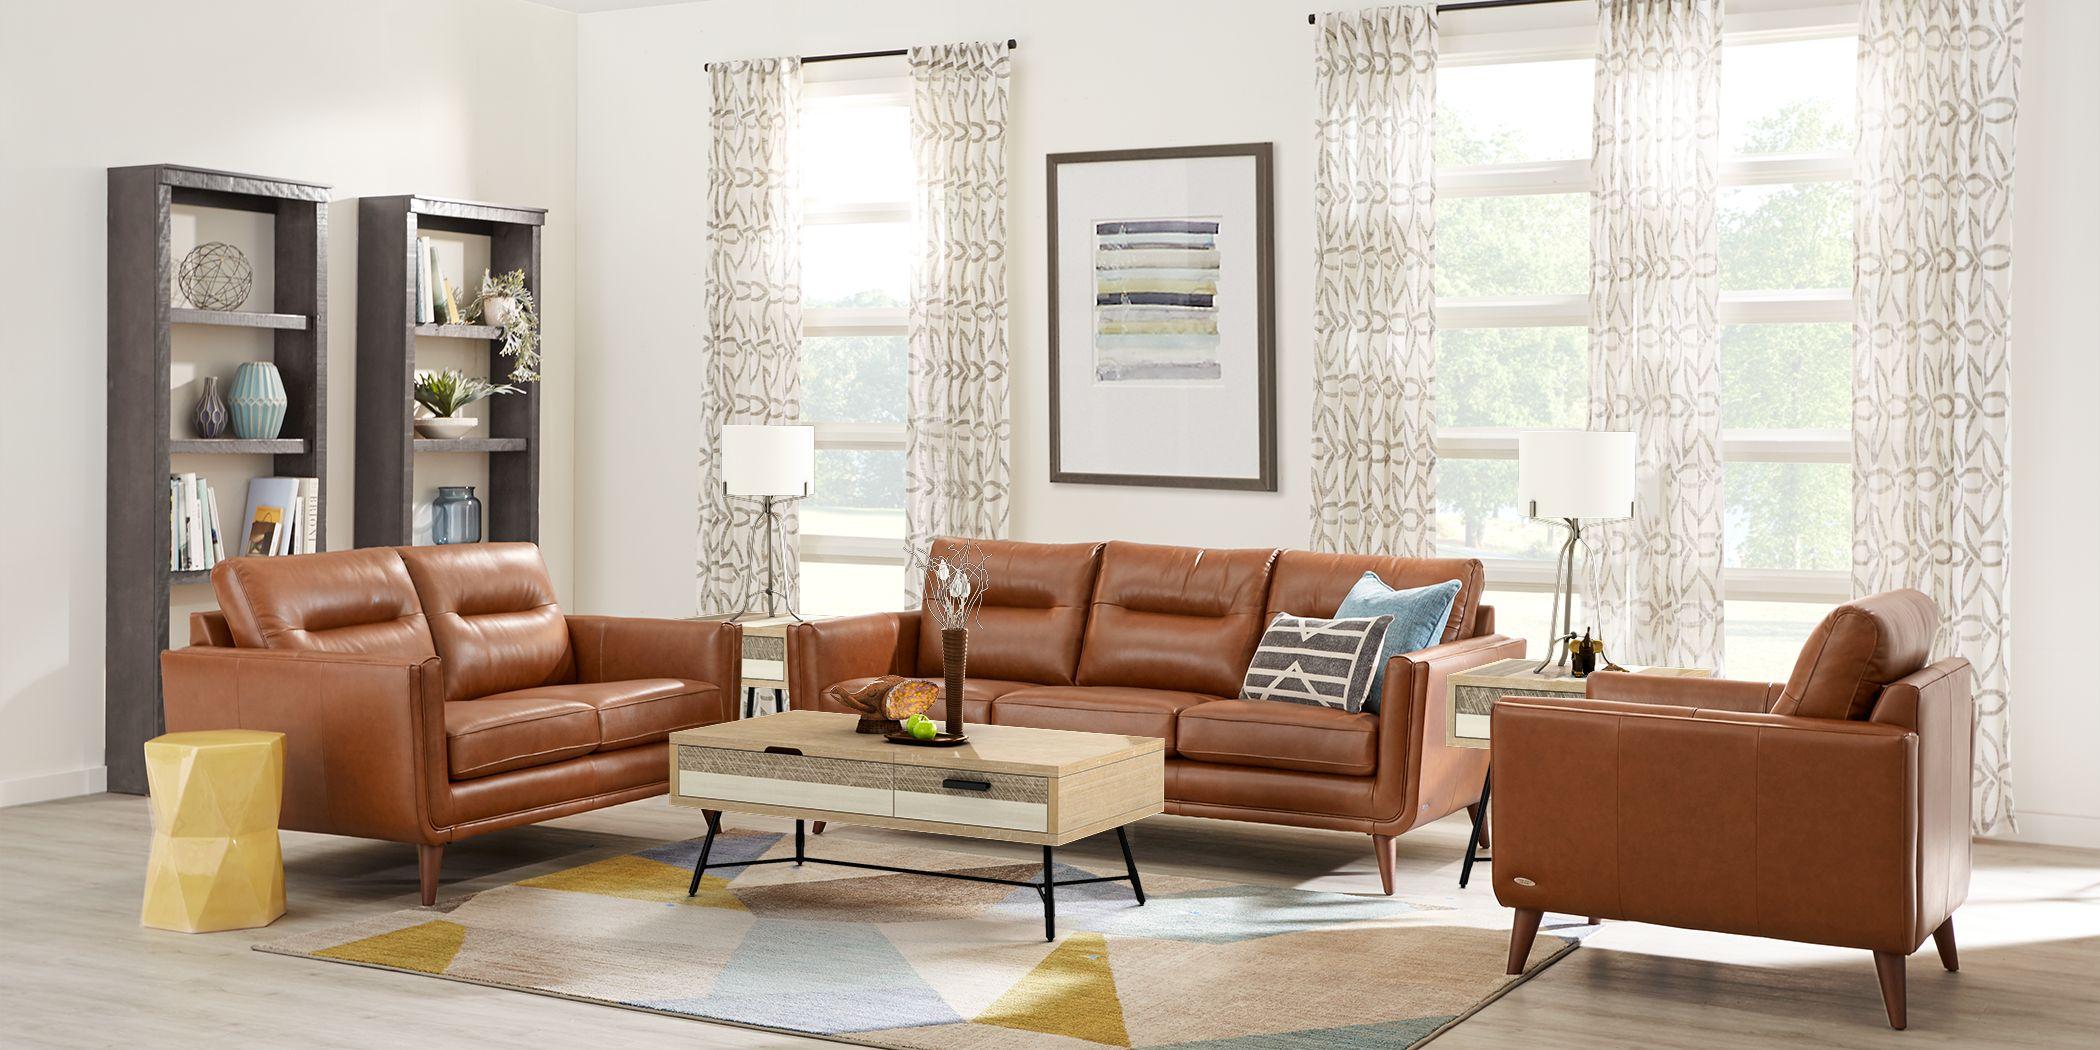 Cindy Crawford Home San Salerno Saddle Leather 7 Pc Living Room